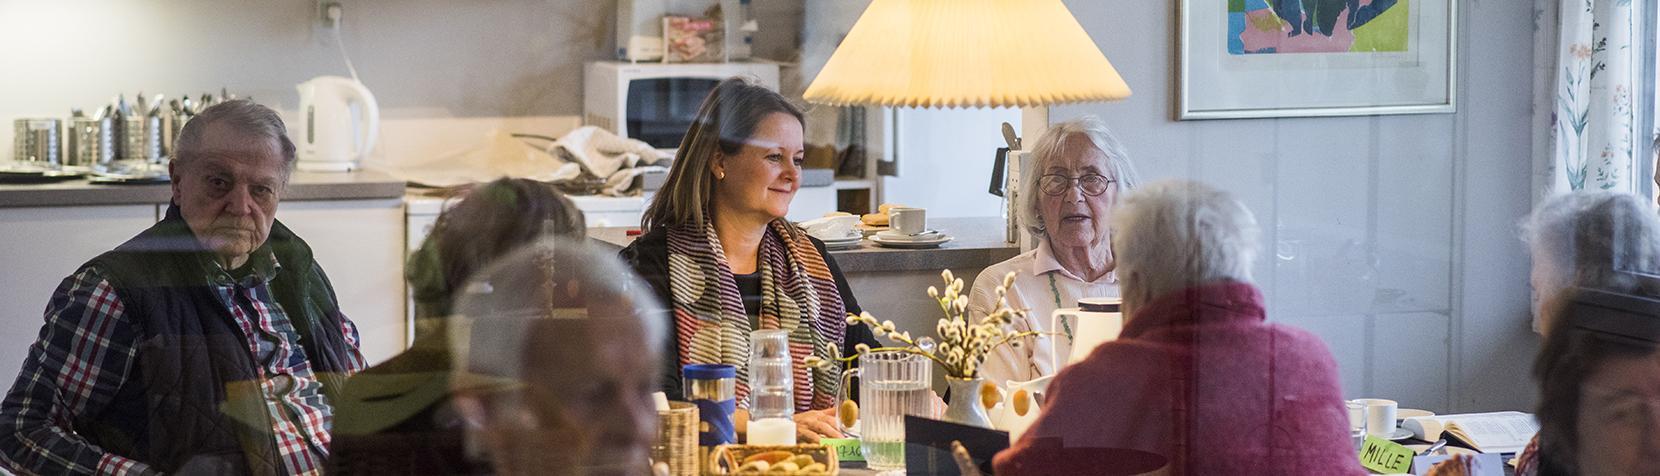 Senior borgere til fællesspisning